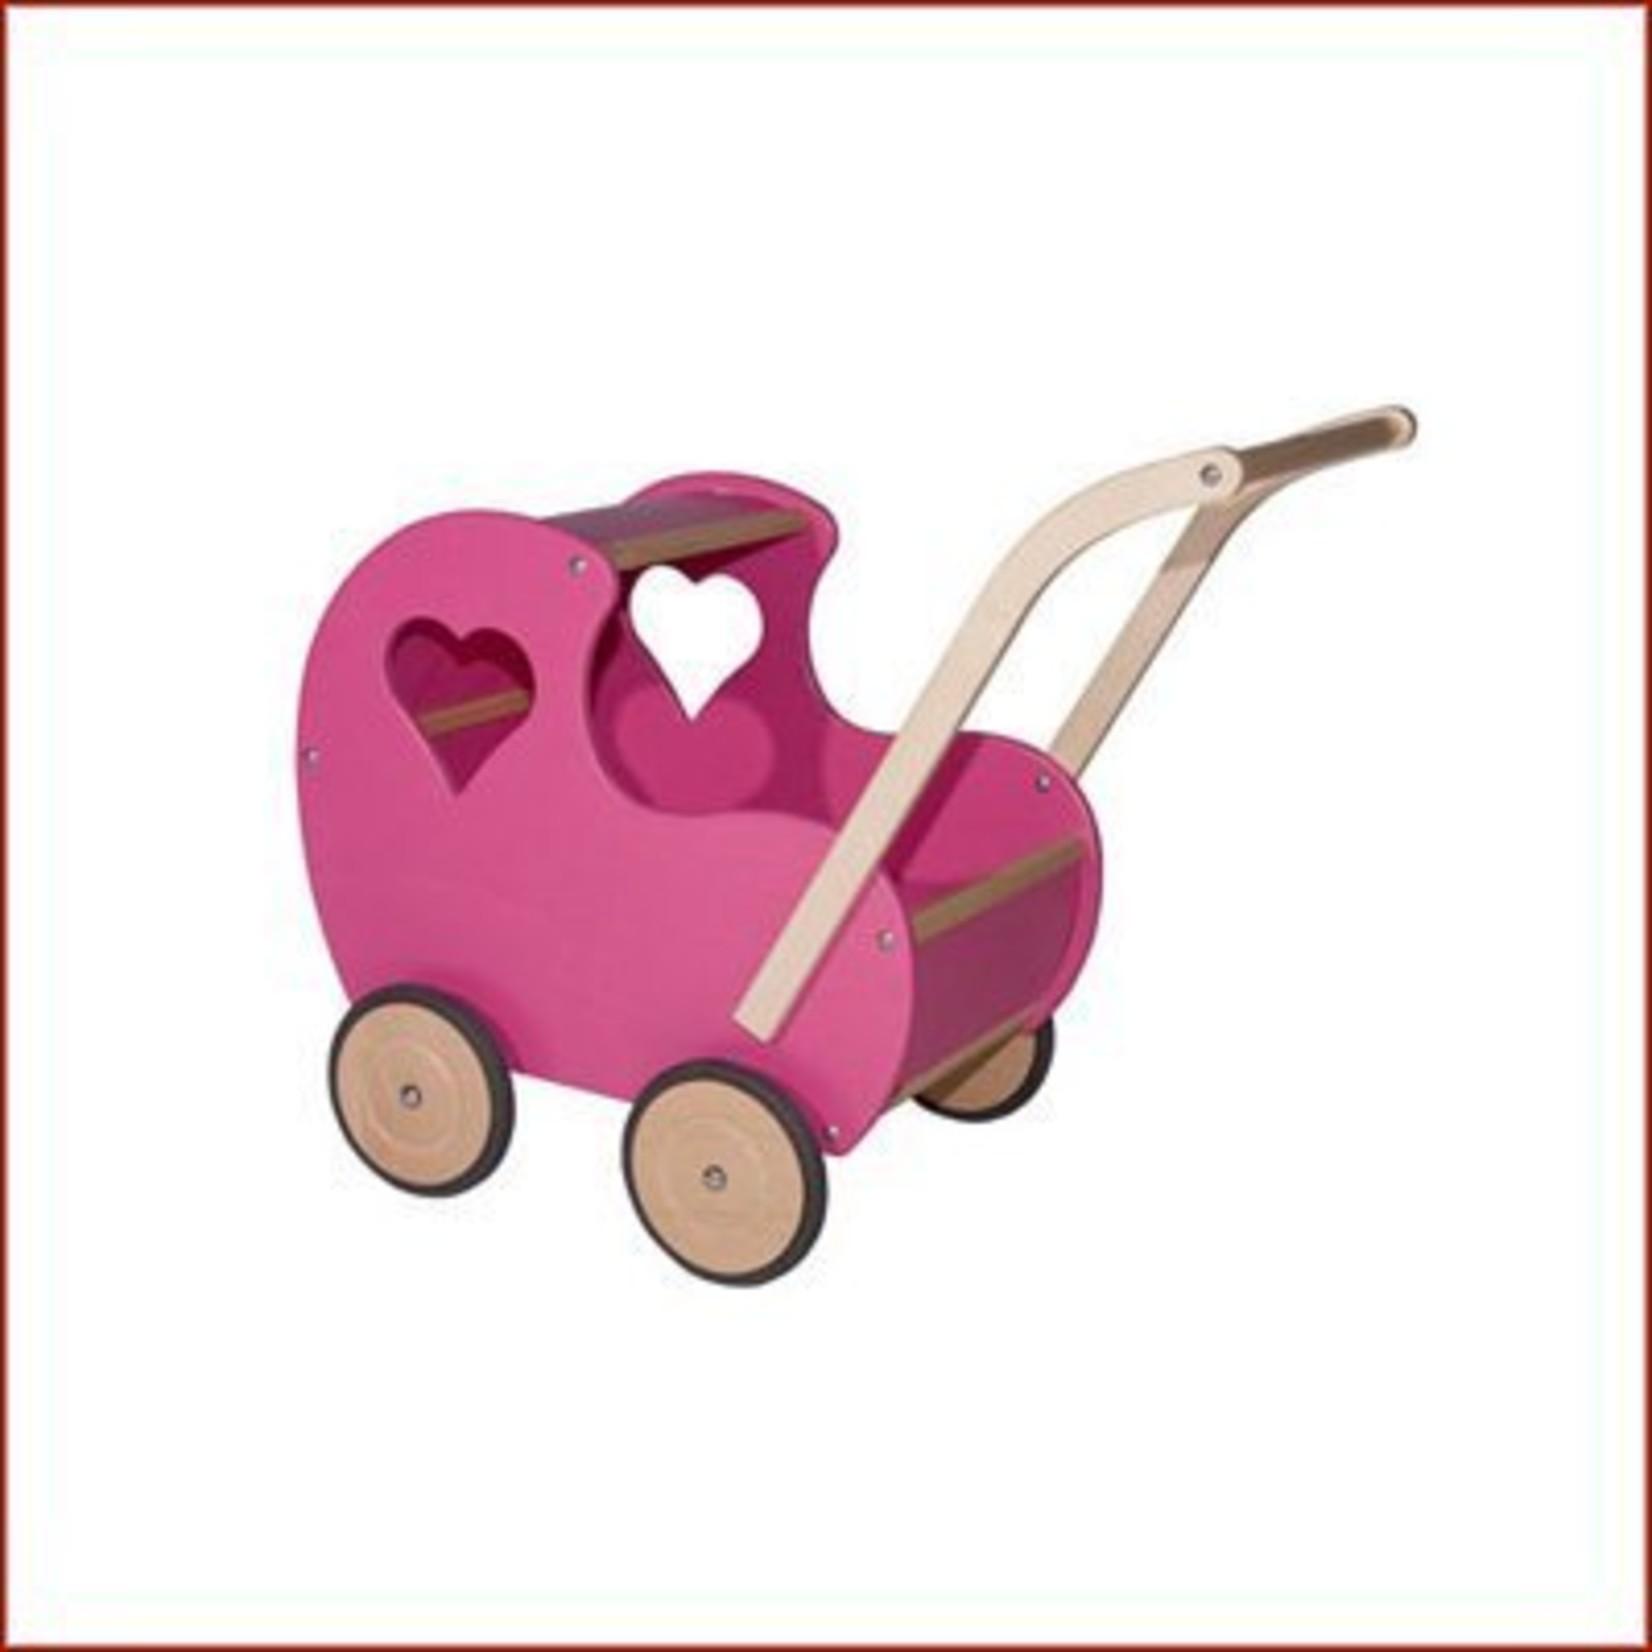 Van Dijk Toys Poppenwagen Retro Rosé